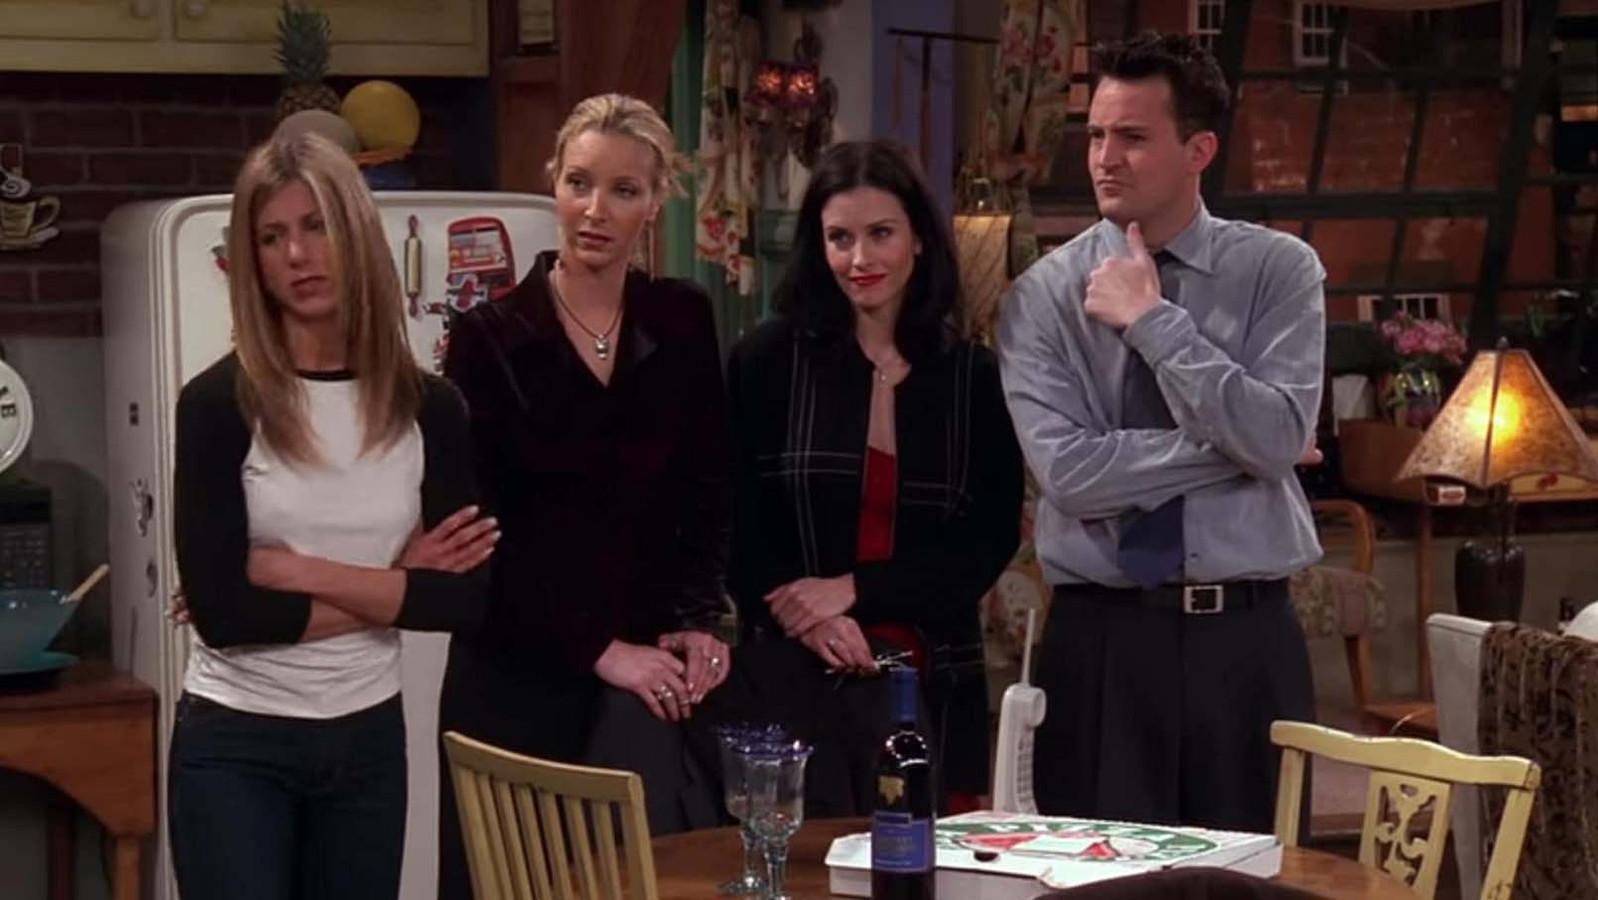 Jennifer Aniston (als Rachel), Lisa Kudrow (als Phoebe), Courteney Cox (als Monica) en Matthew Perry (als Chandler).